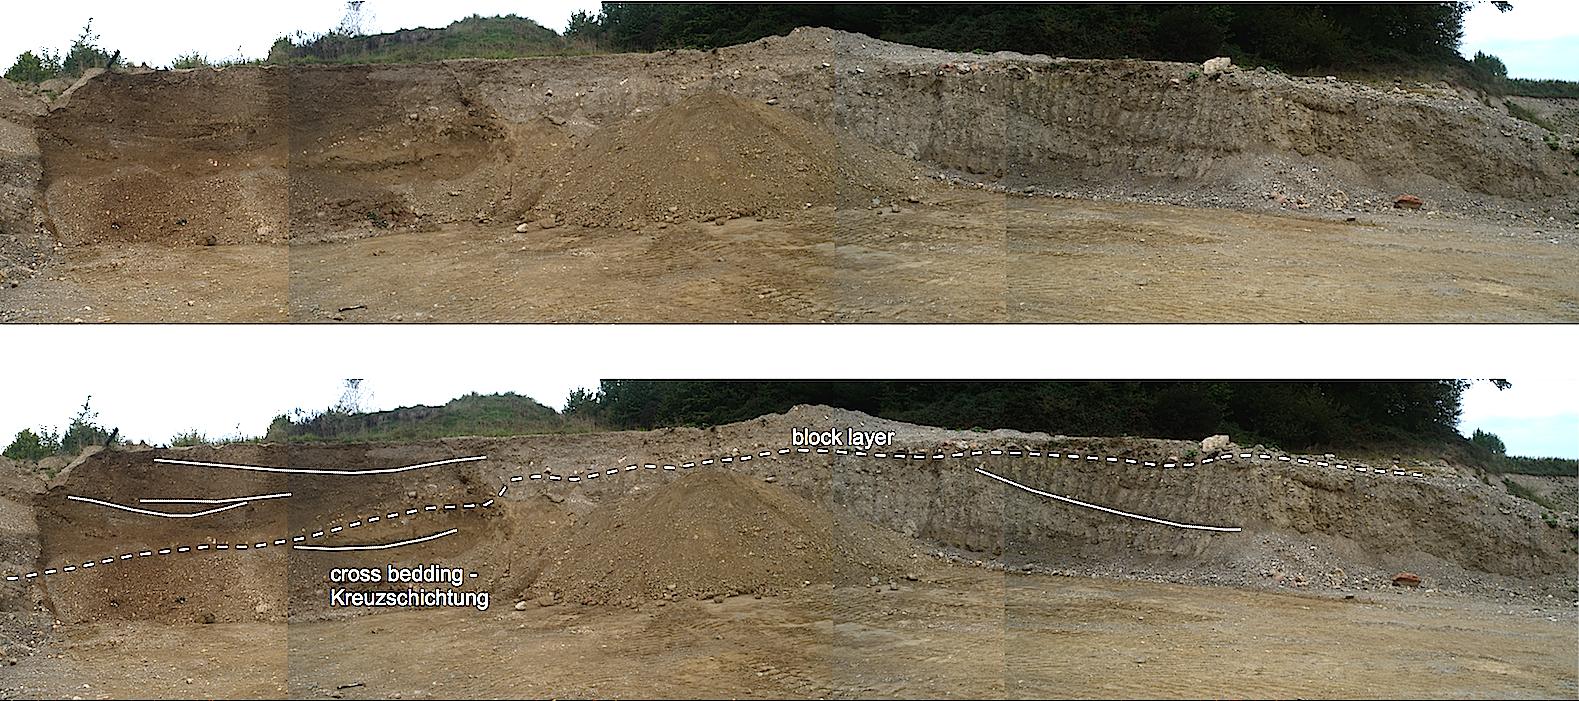 Kreuzschichtung Diamiktit Chiemsee Tsunami Chiemgau Impakt